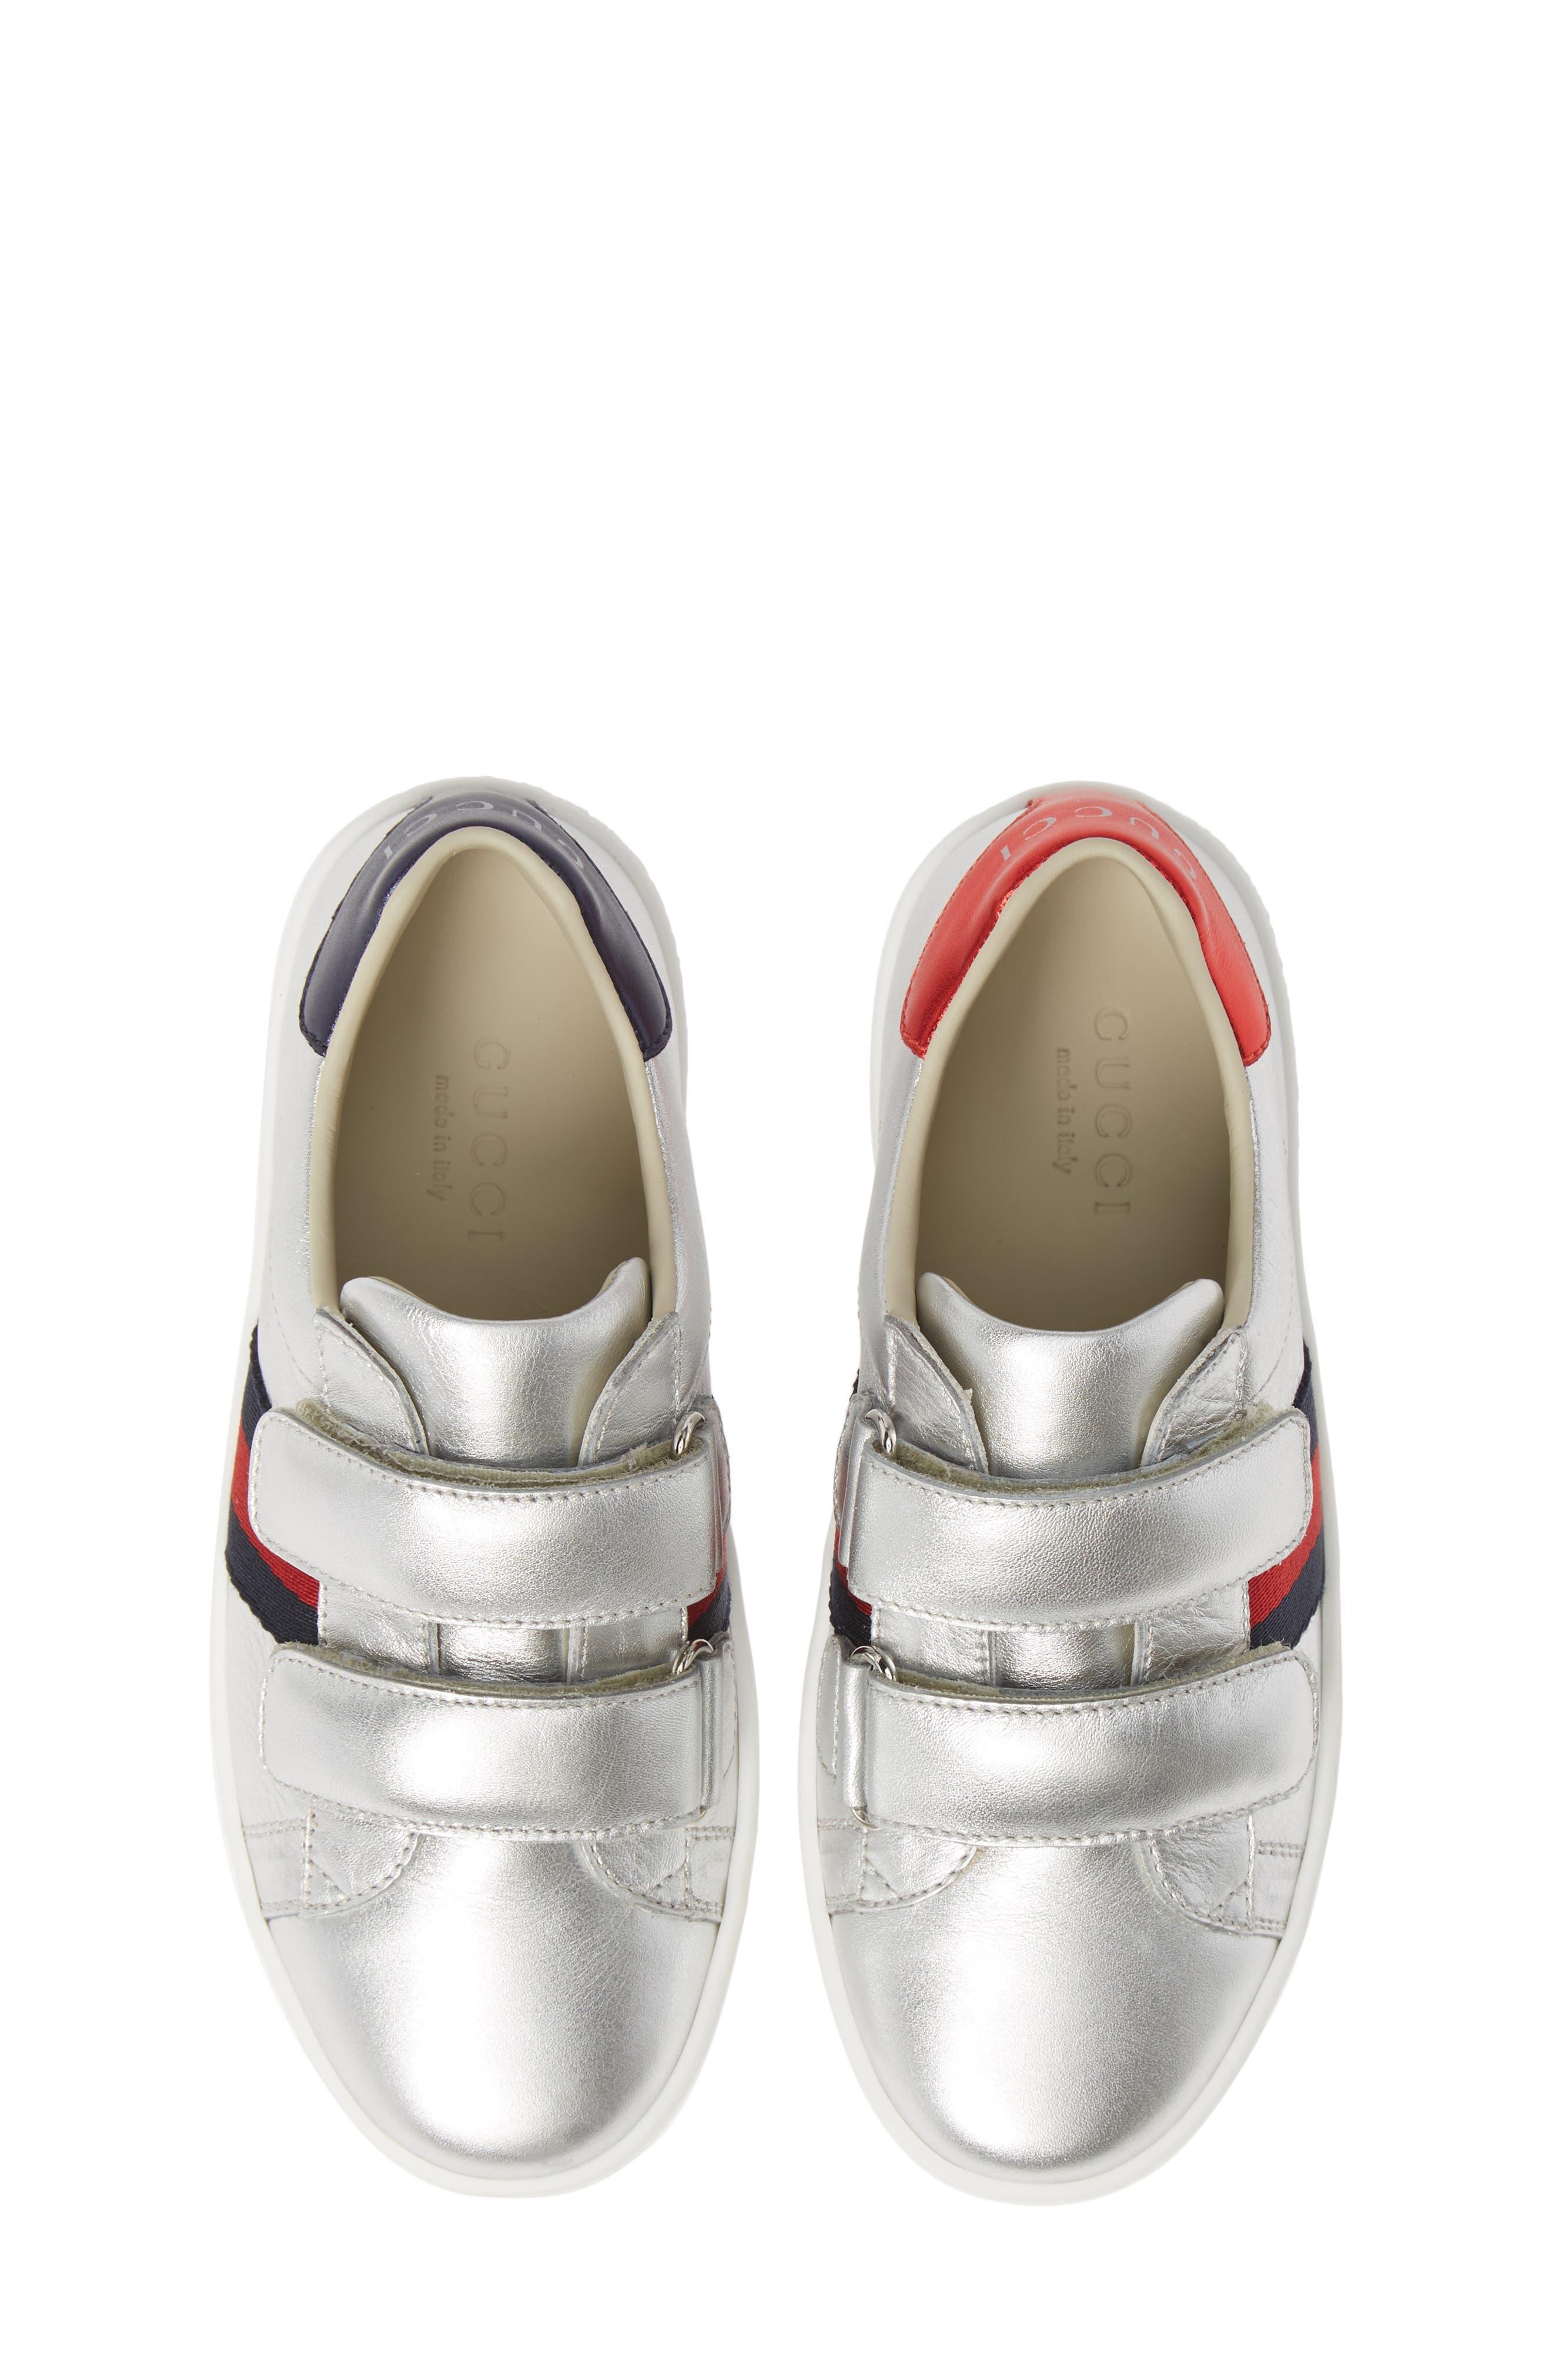 46e109147bb Kids  Gucci Shoes